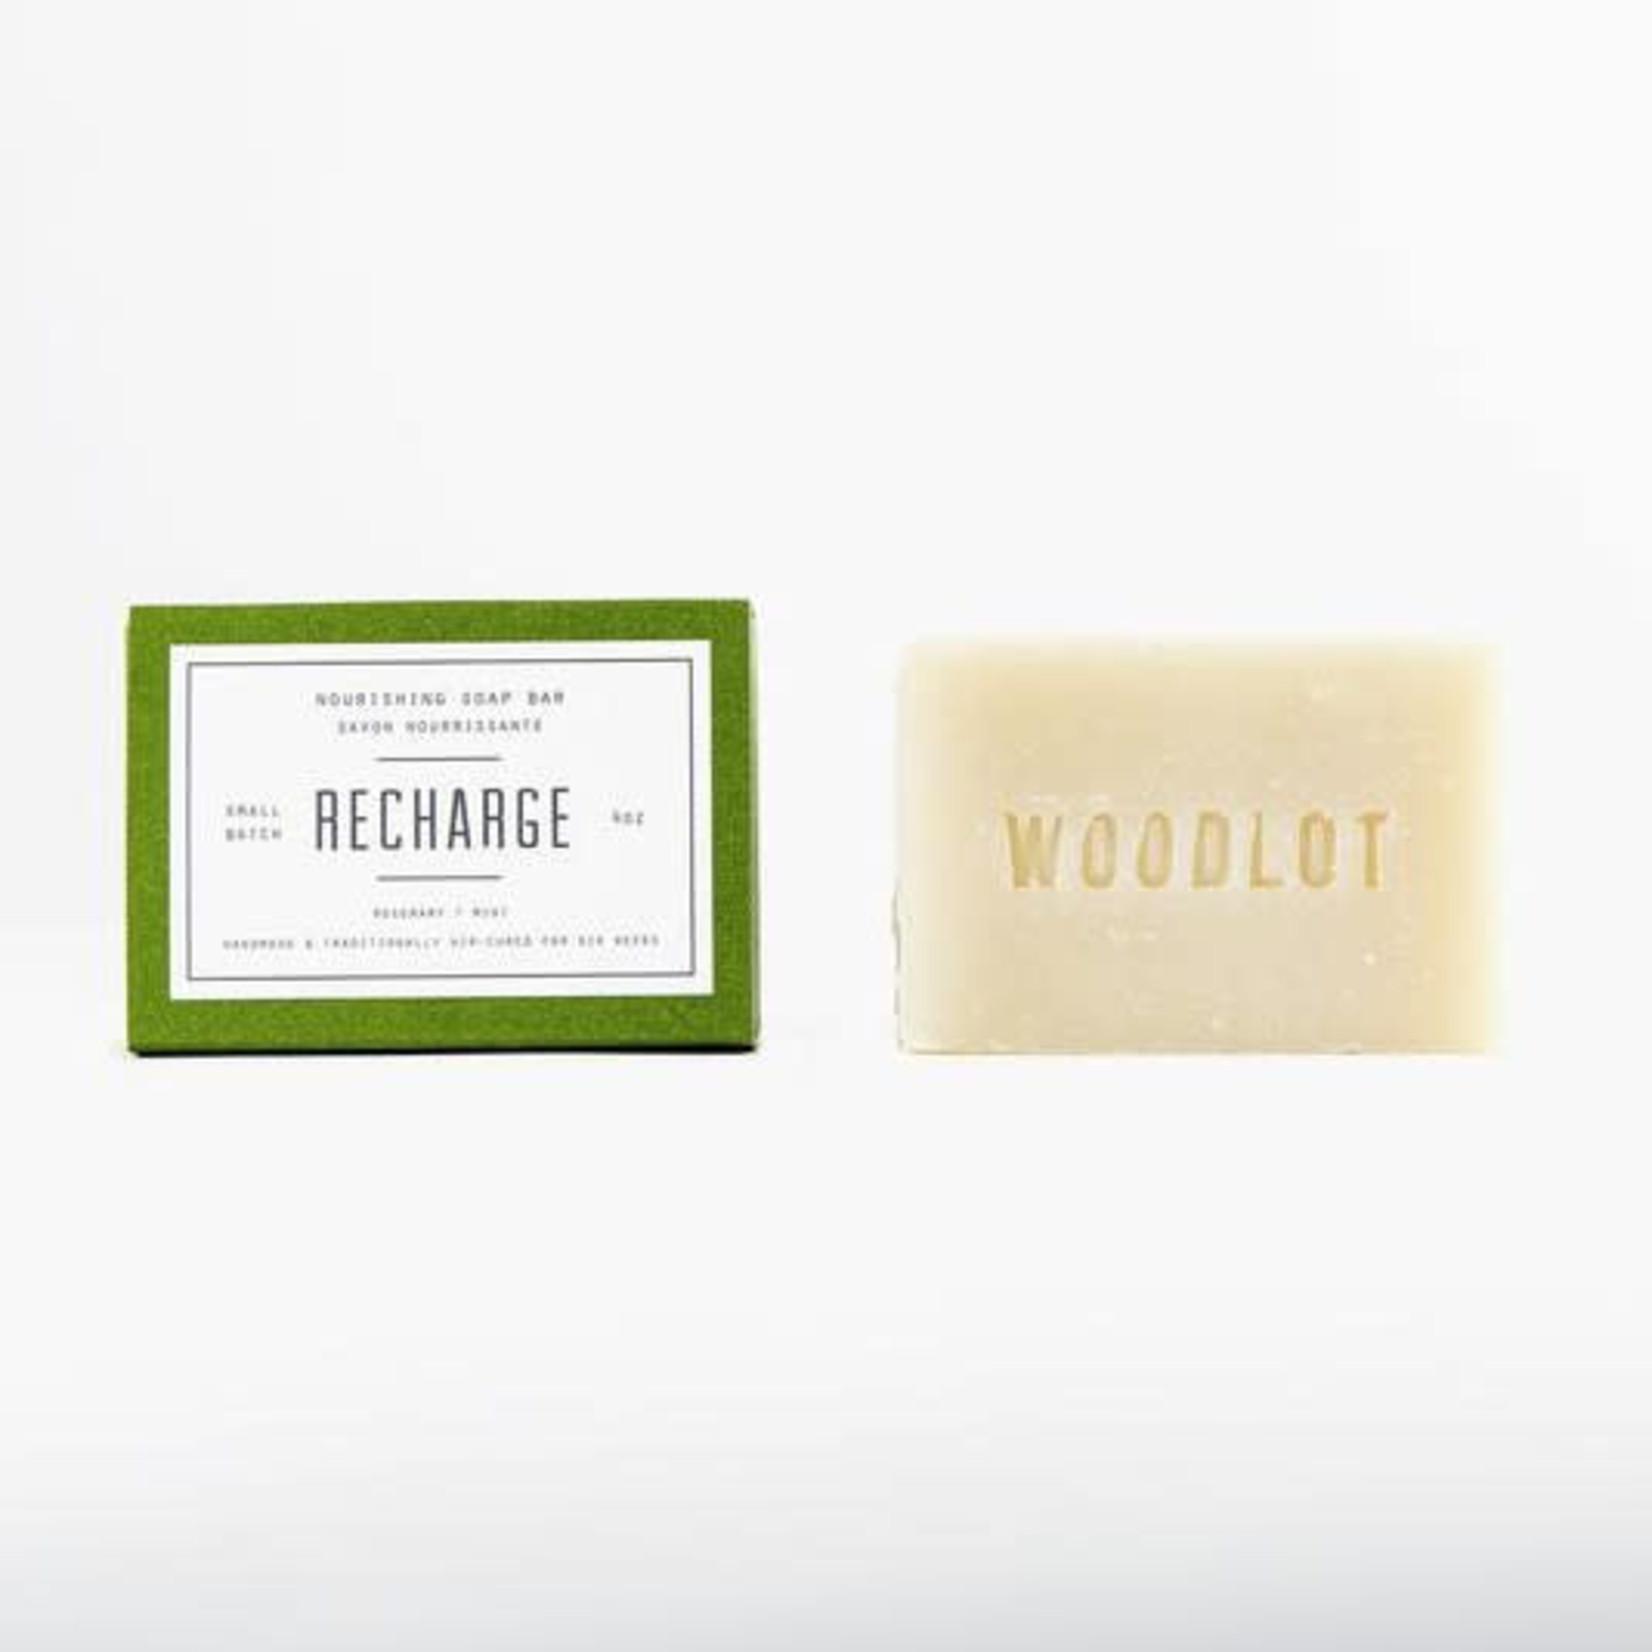 WOODLOT SOAP BAR - RECHARGE